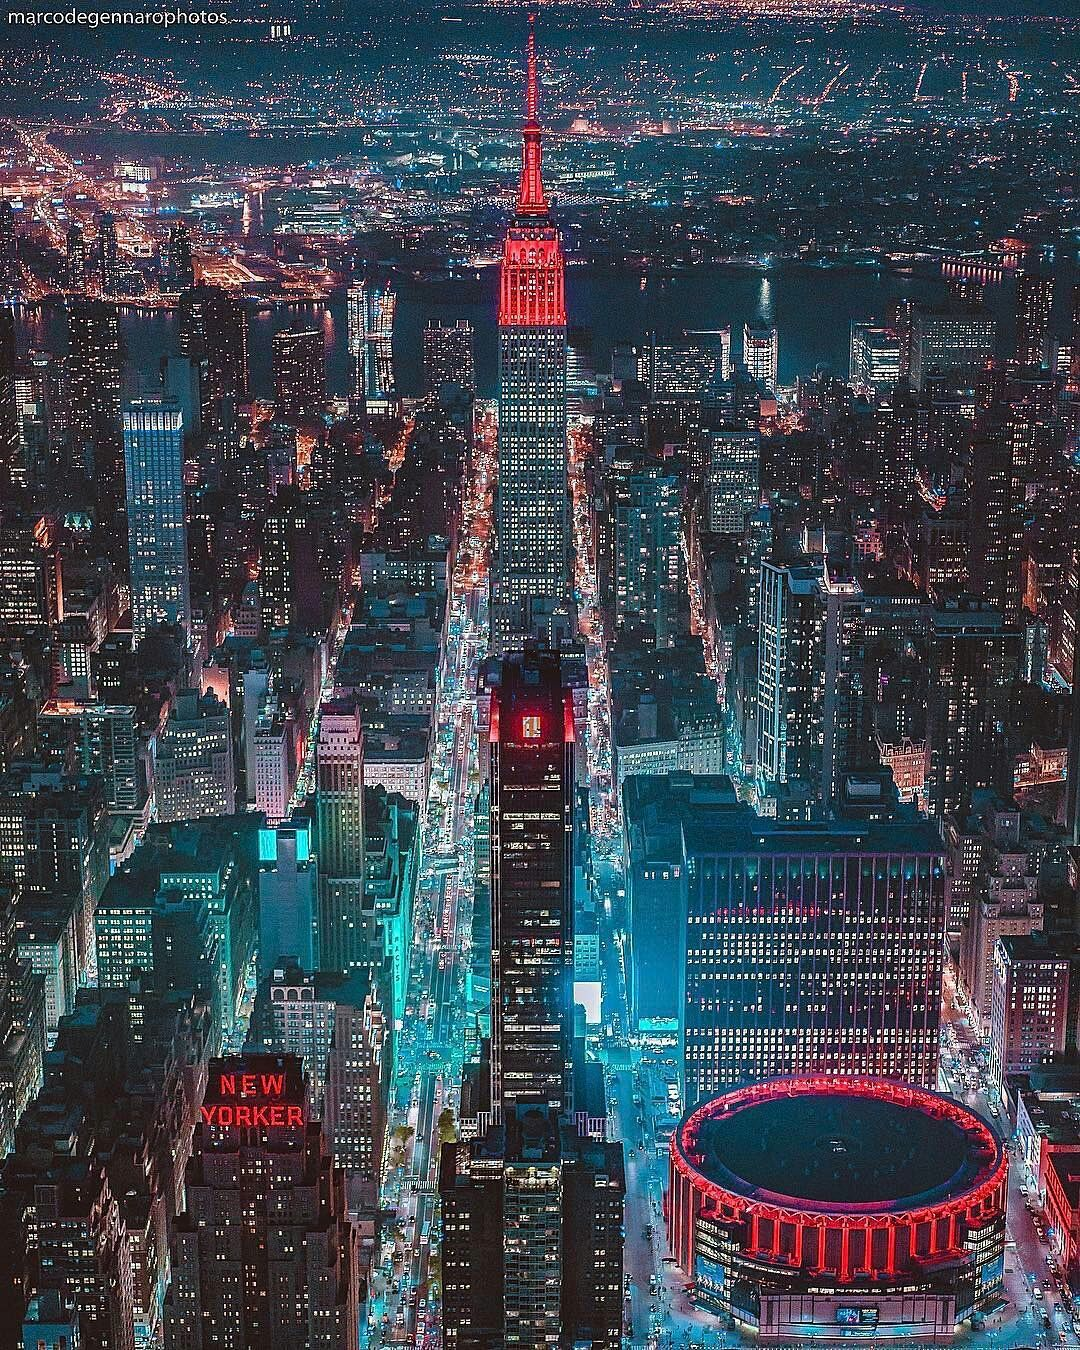 Empire State Building By Marco Degennaro New York City Travel New York Wallpaper New York City Best of new york night wallpaper for